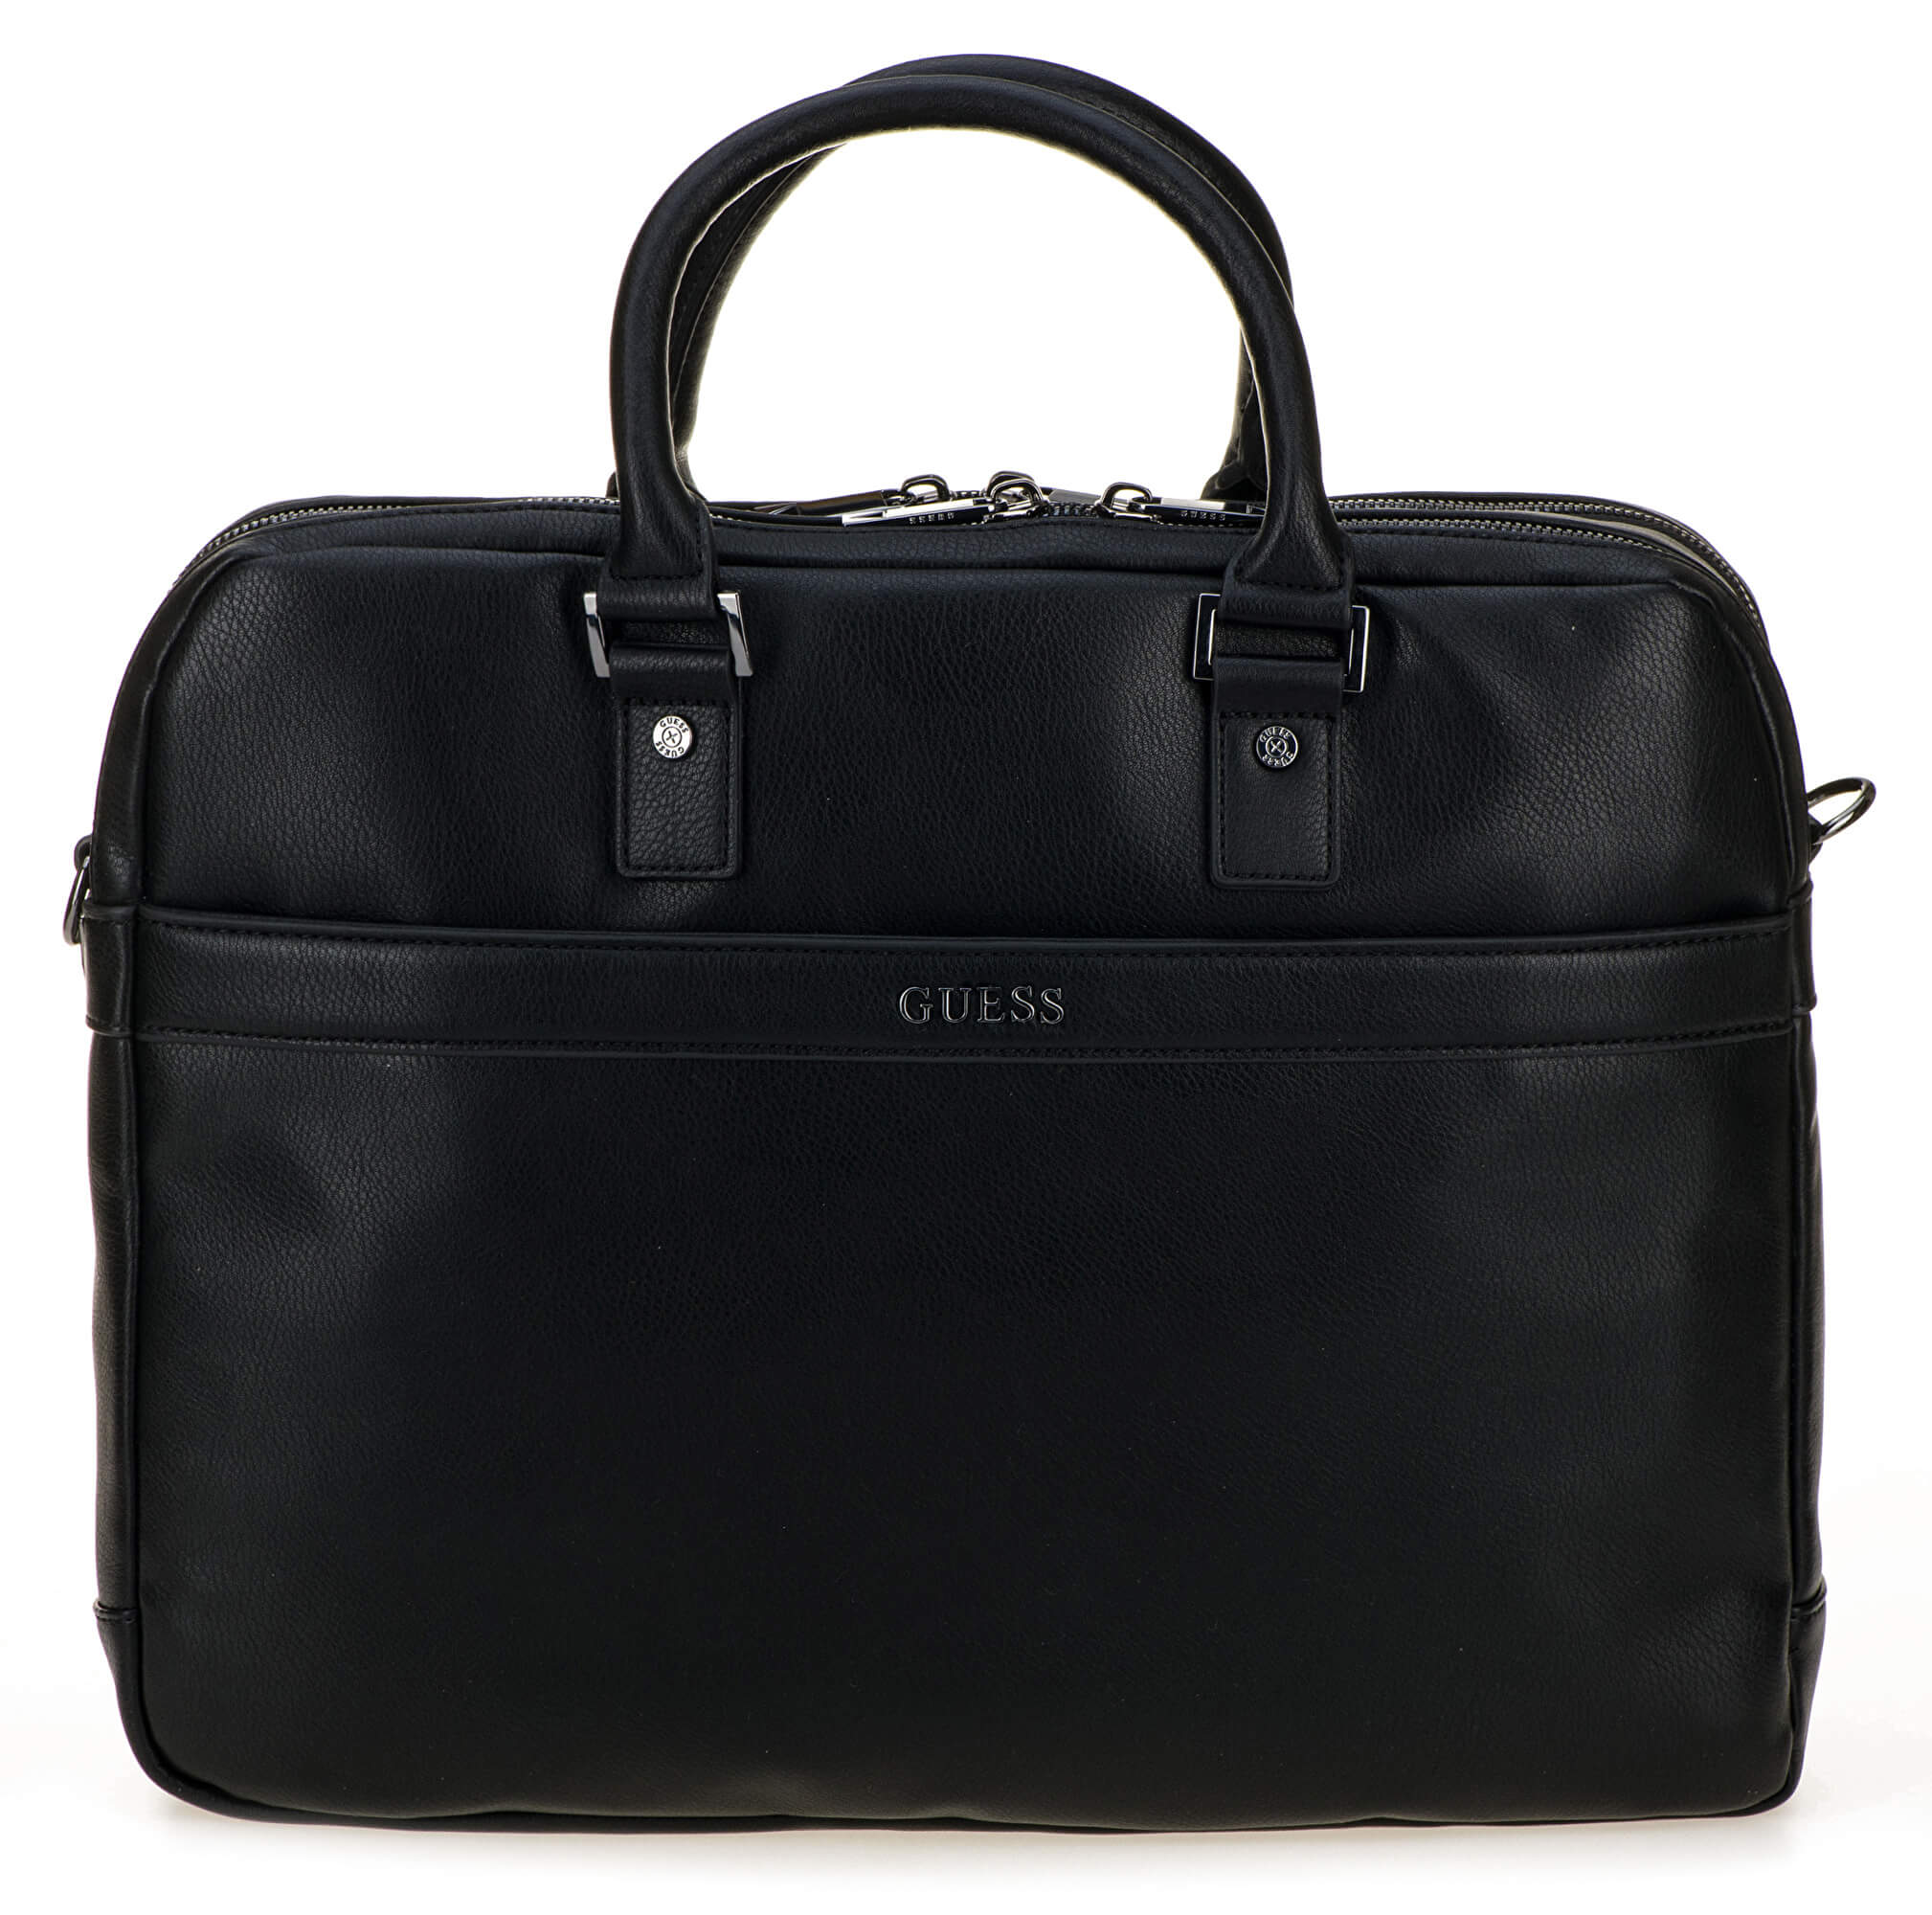 Guess Férfi táska City Workbag Double Compartmen HM6540 Black ... 45129ef7b9